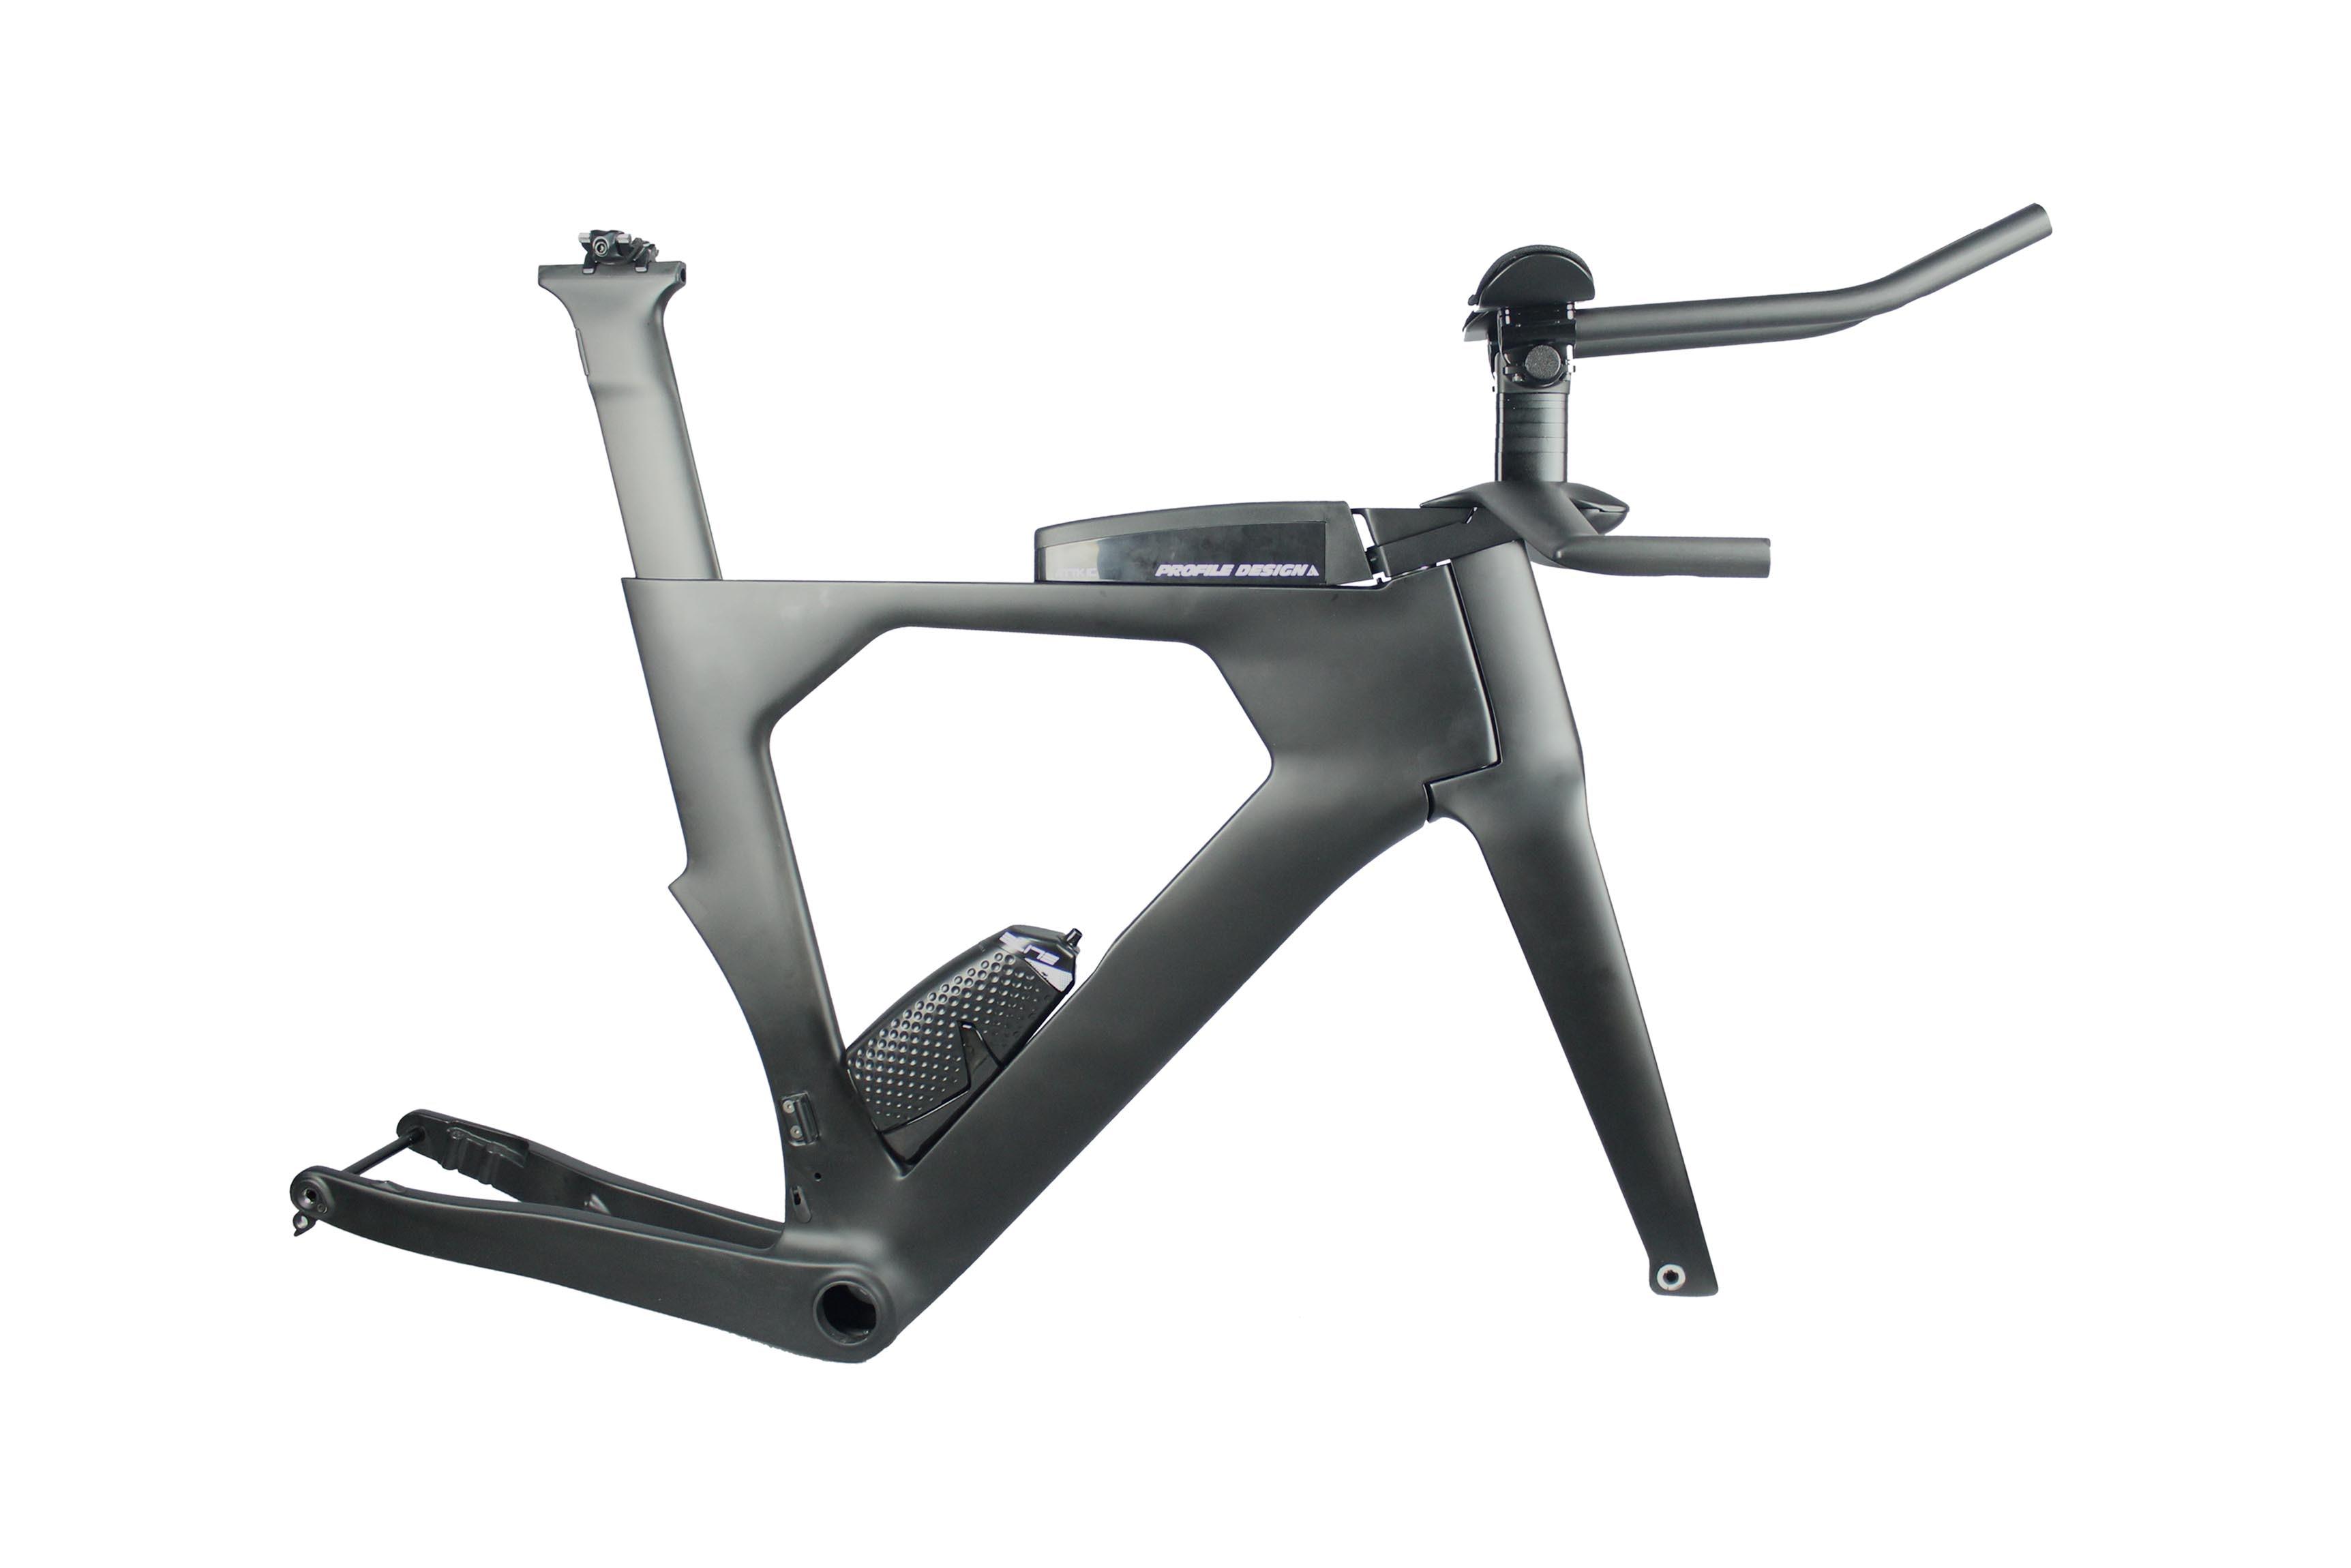 Miracle New Design Full Carbon TT Bike Frameset Disc Triathlon Carbon Bicycle Frame, Flat Mount Disc Time Trial Frame